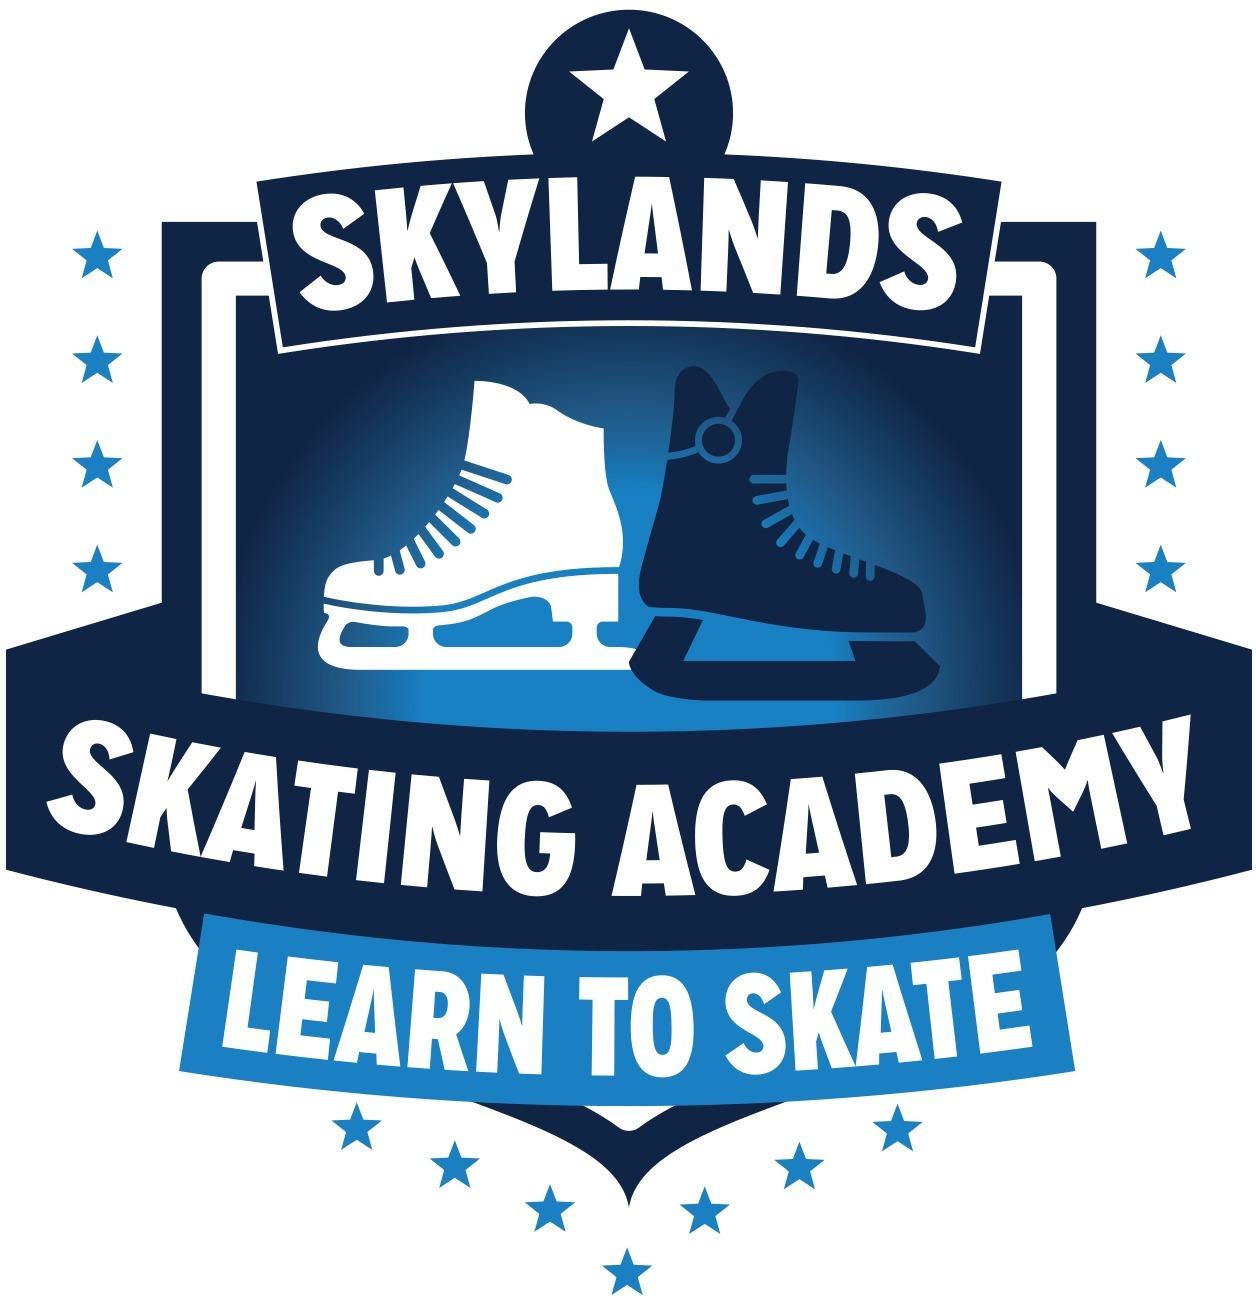 8c64d76c2fd0036548f6_skylands_skating_academy.jpg